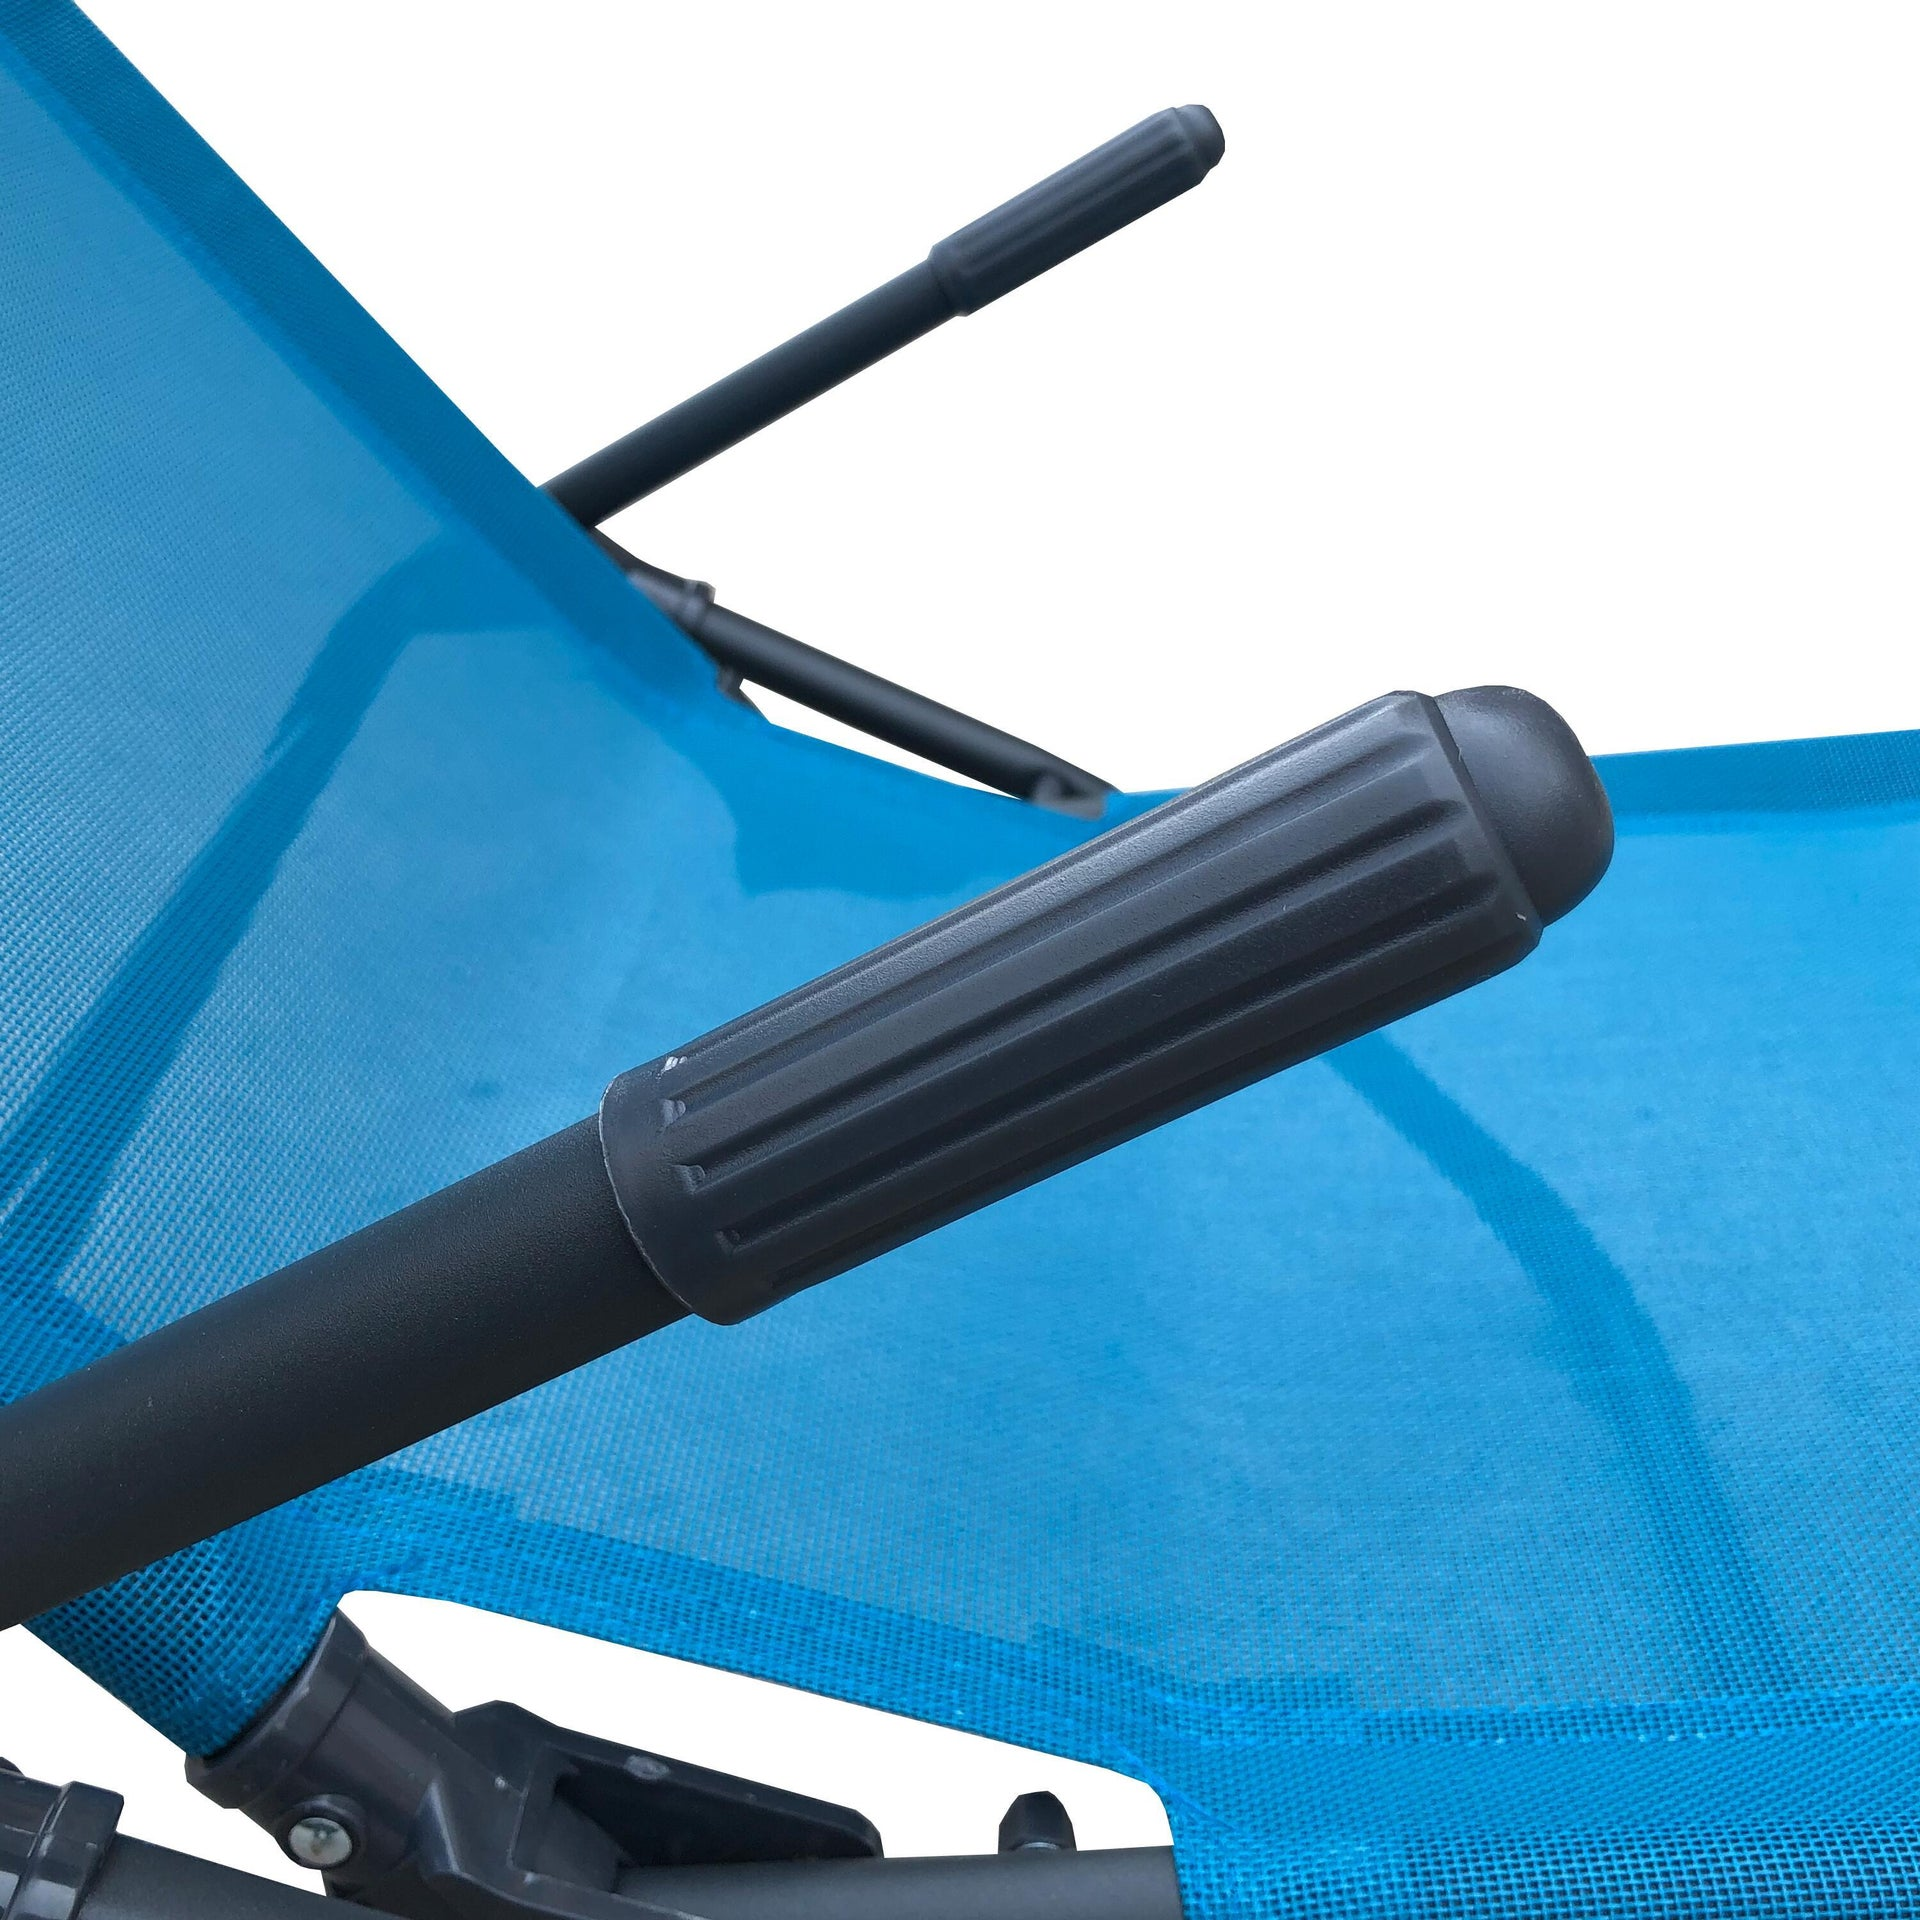 Lettino senza cuscino Fiesta in acciaio blu - 3